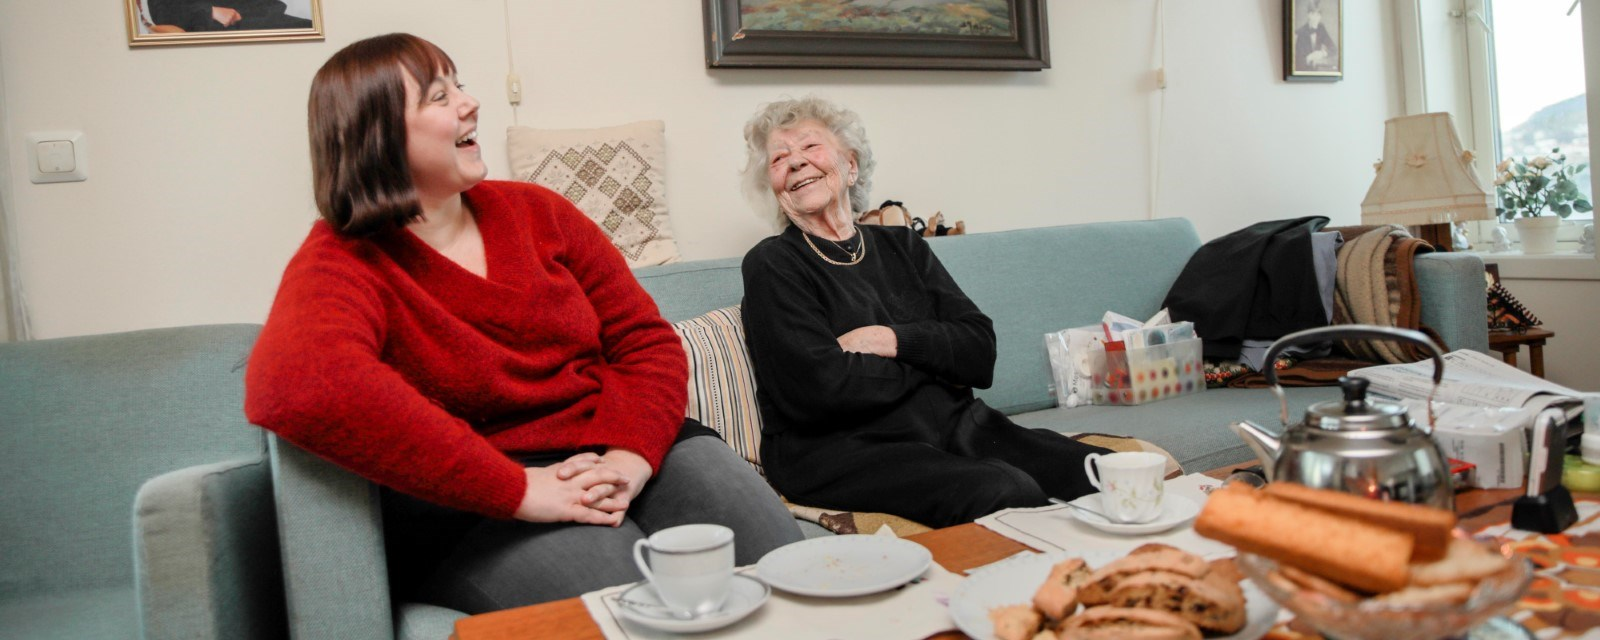 4003738a Bildet viser en besøksvenn fra Røde Kors og en eldre dame. De flirer begge  to